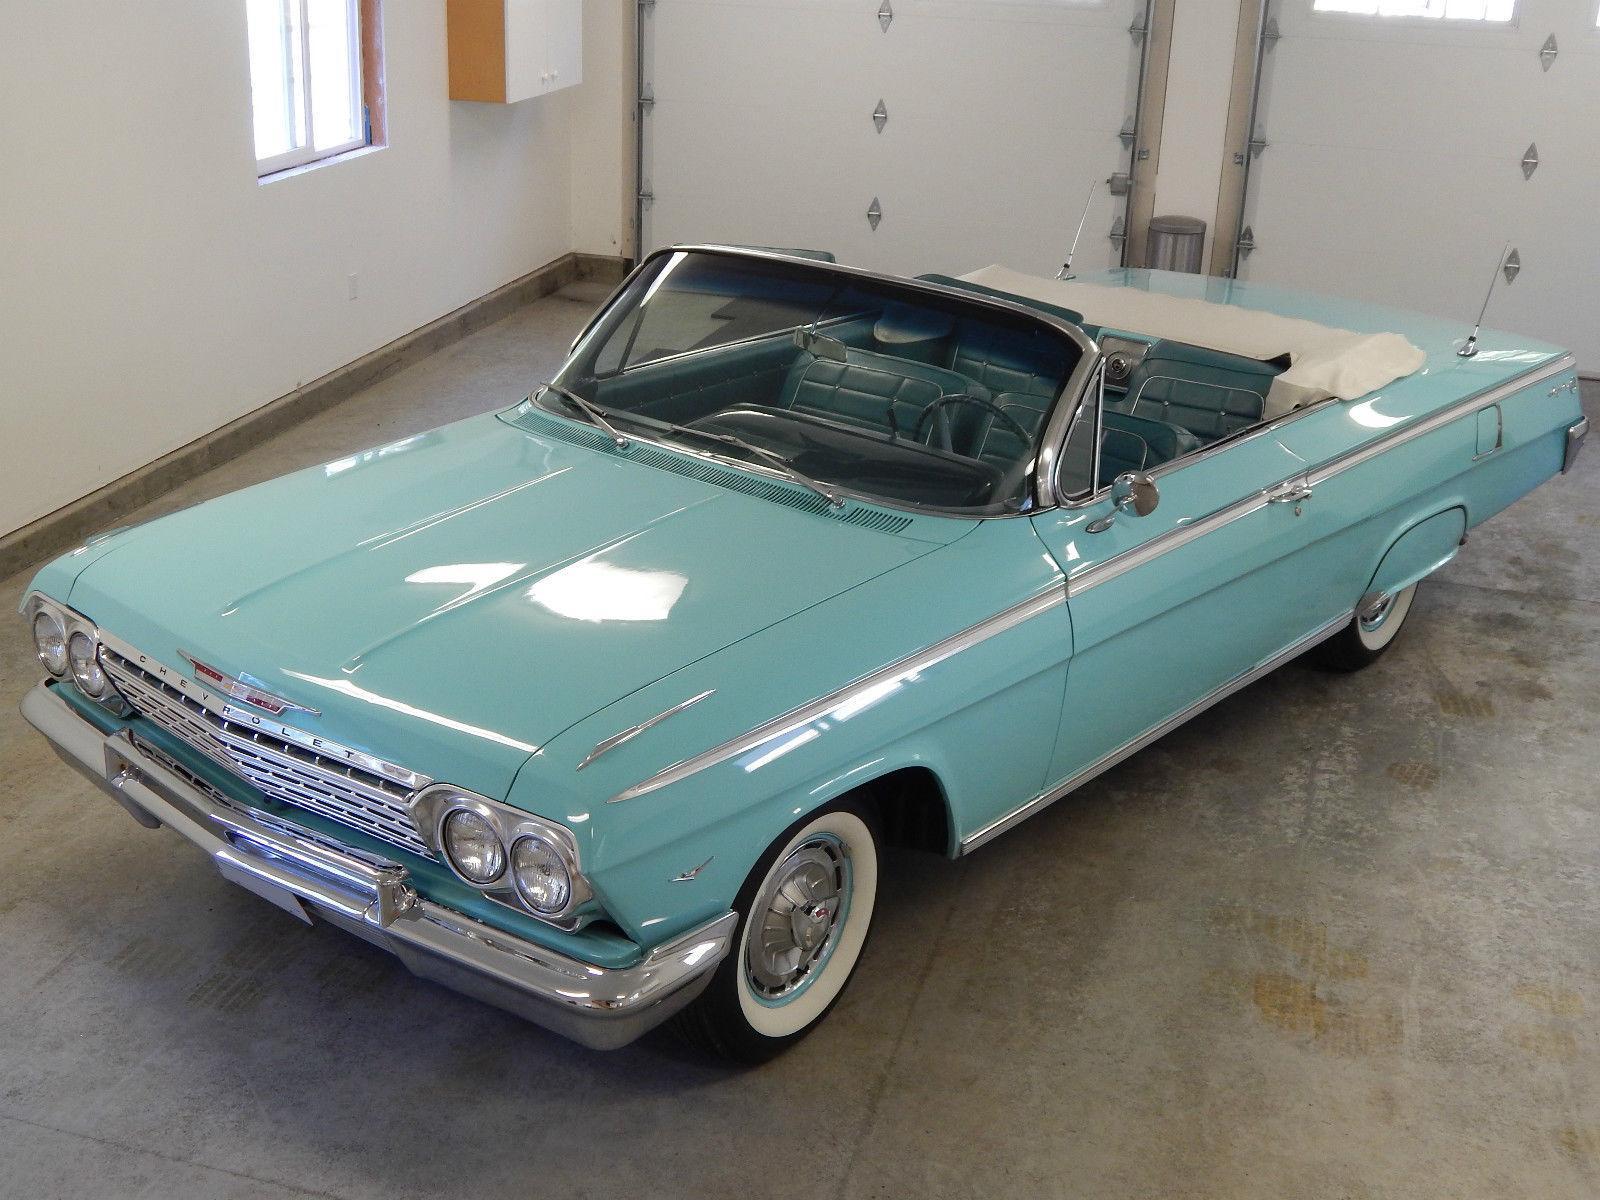 1962 chevrolet impala convertible na prodej. Black Bedroom Furniture Sets. Home Design Ideas